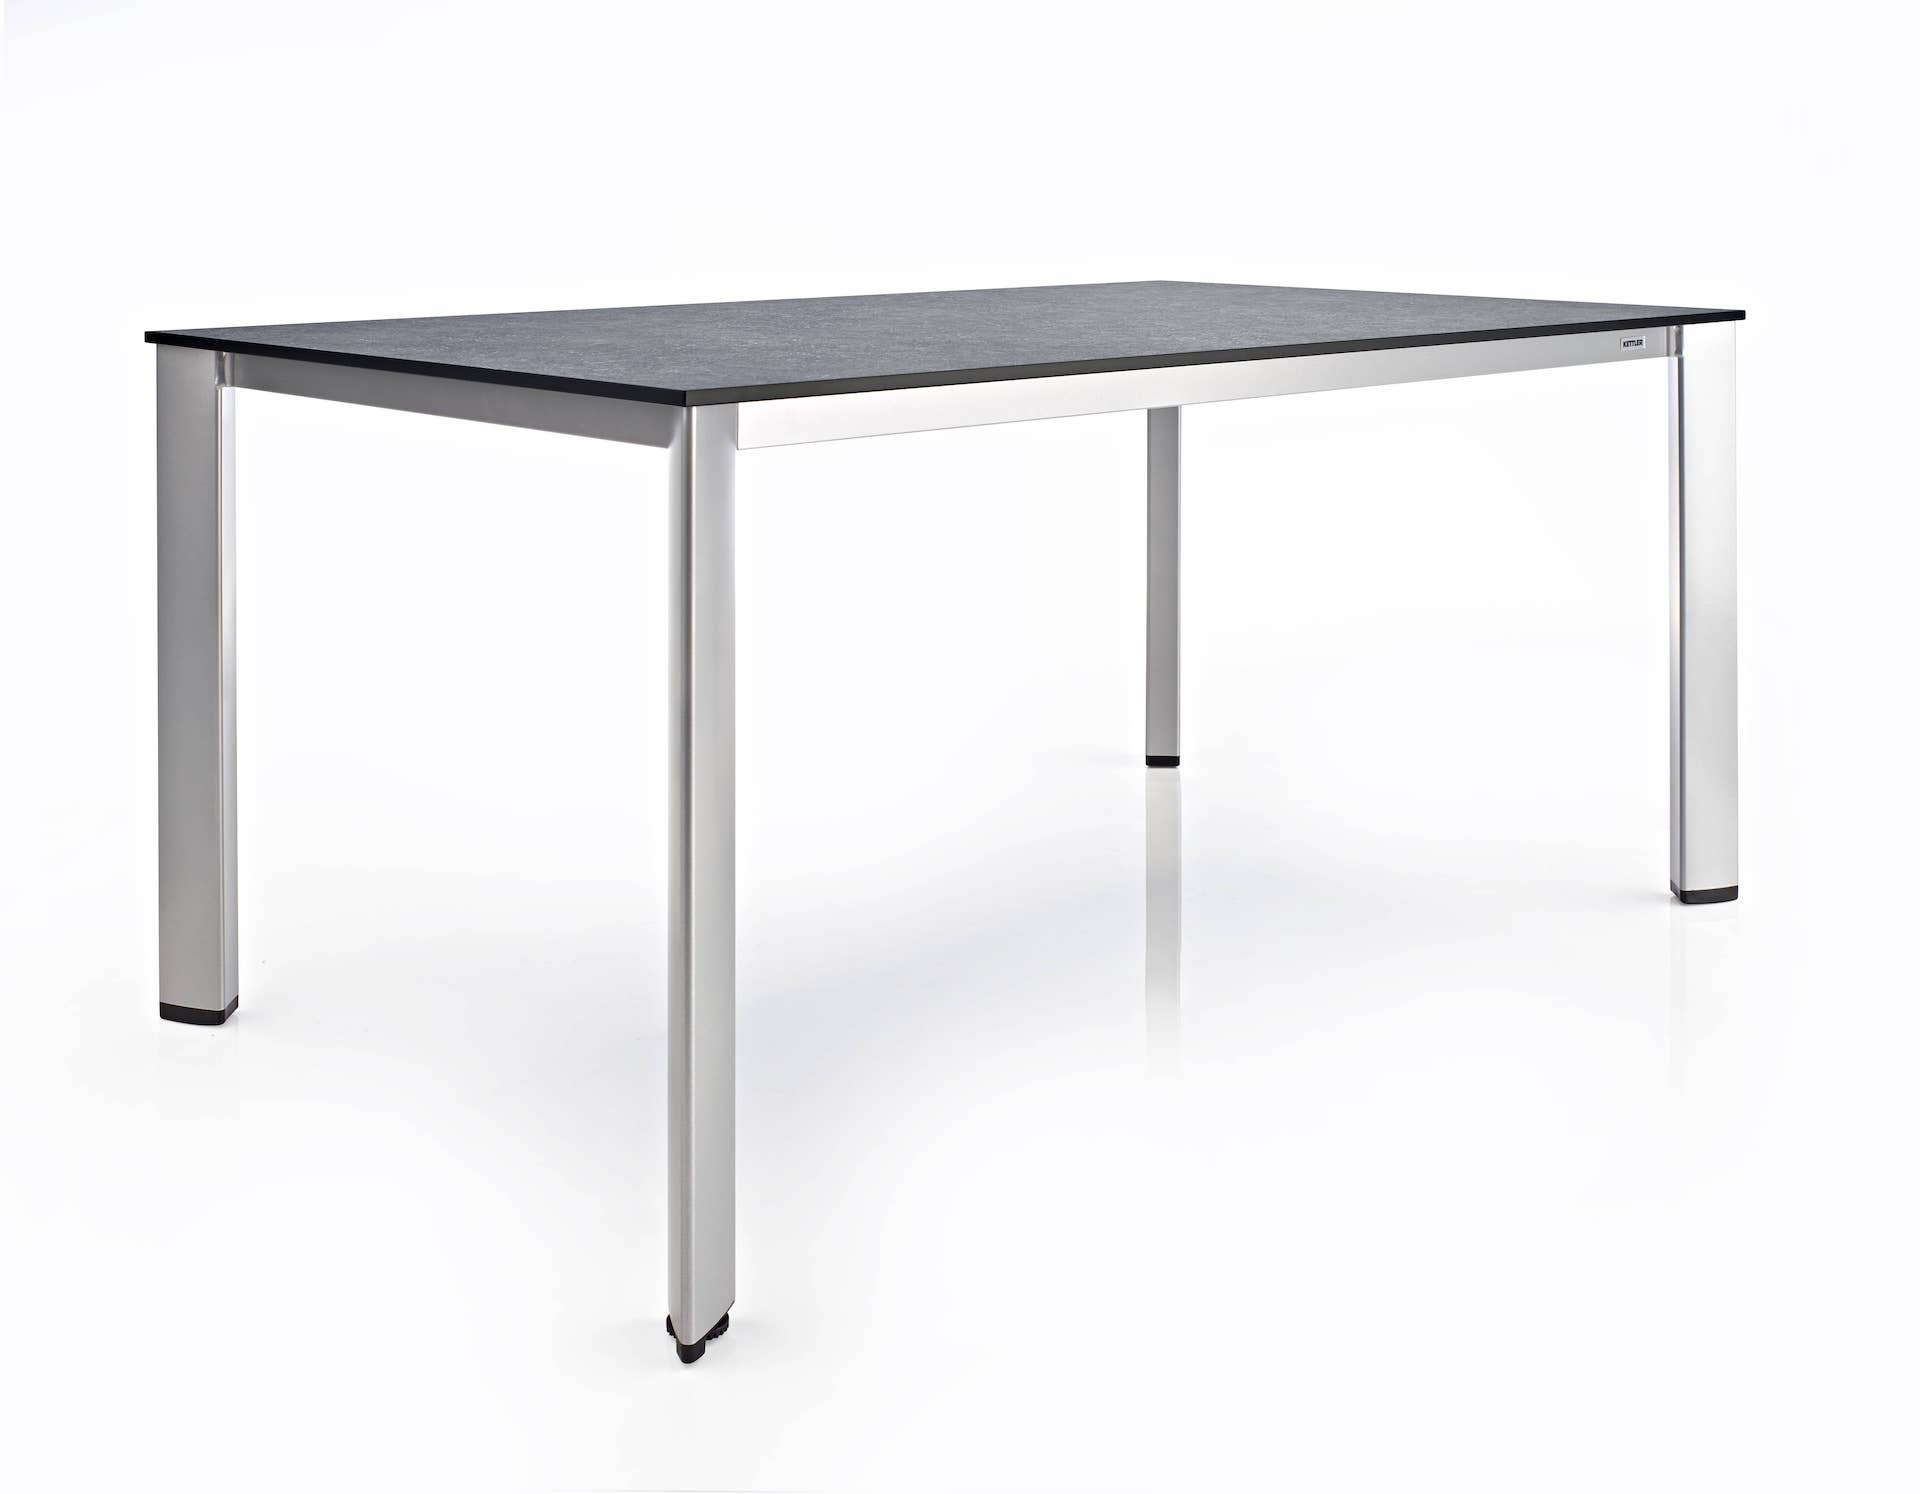 EDGE Tischgestell 160 x 95 cm